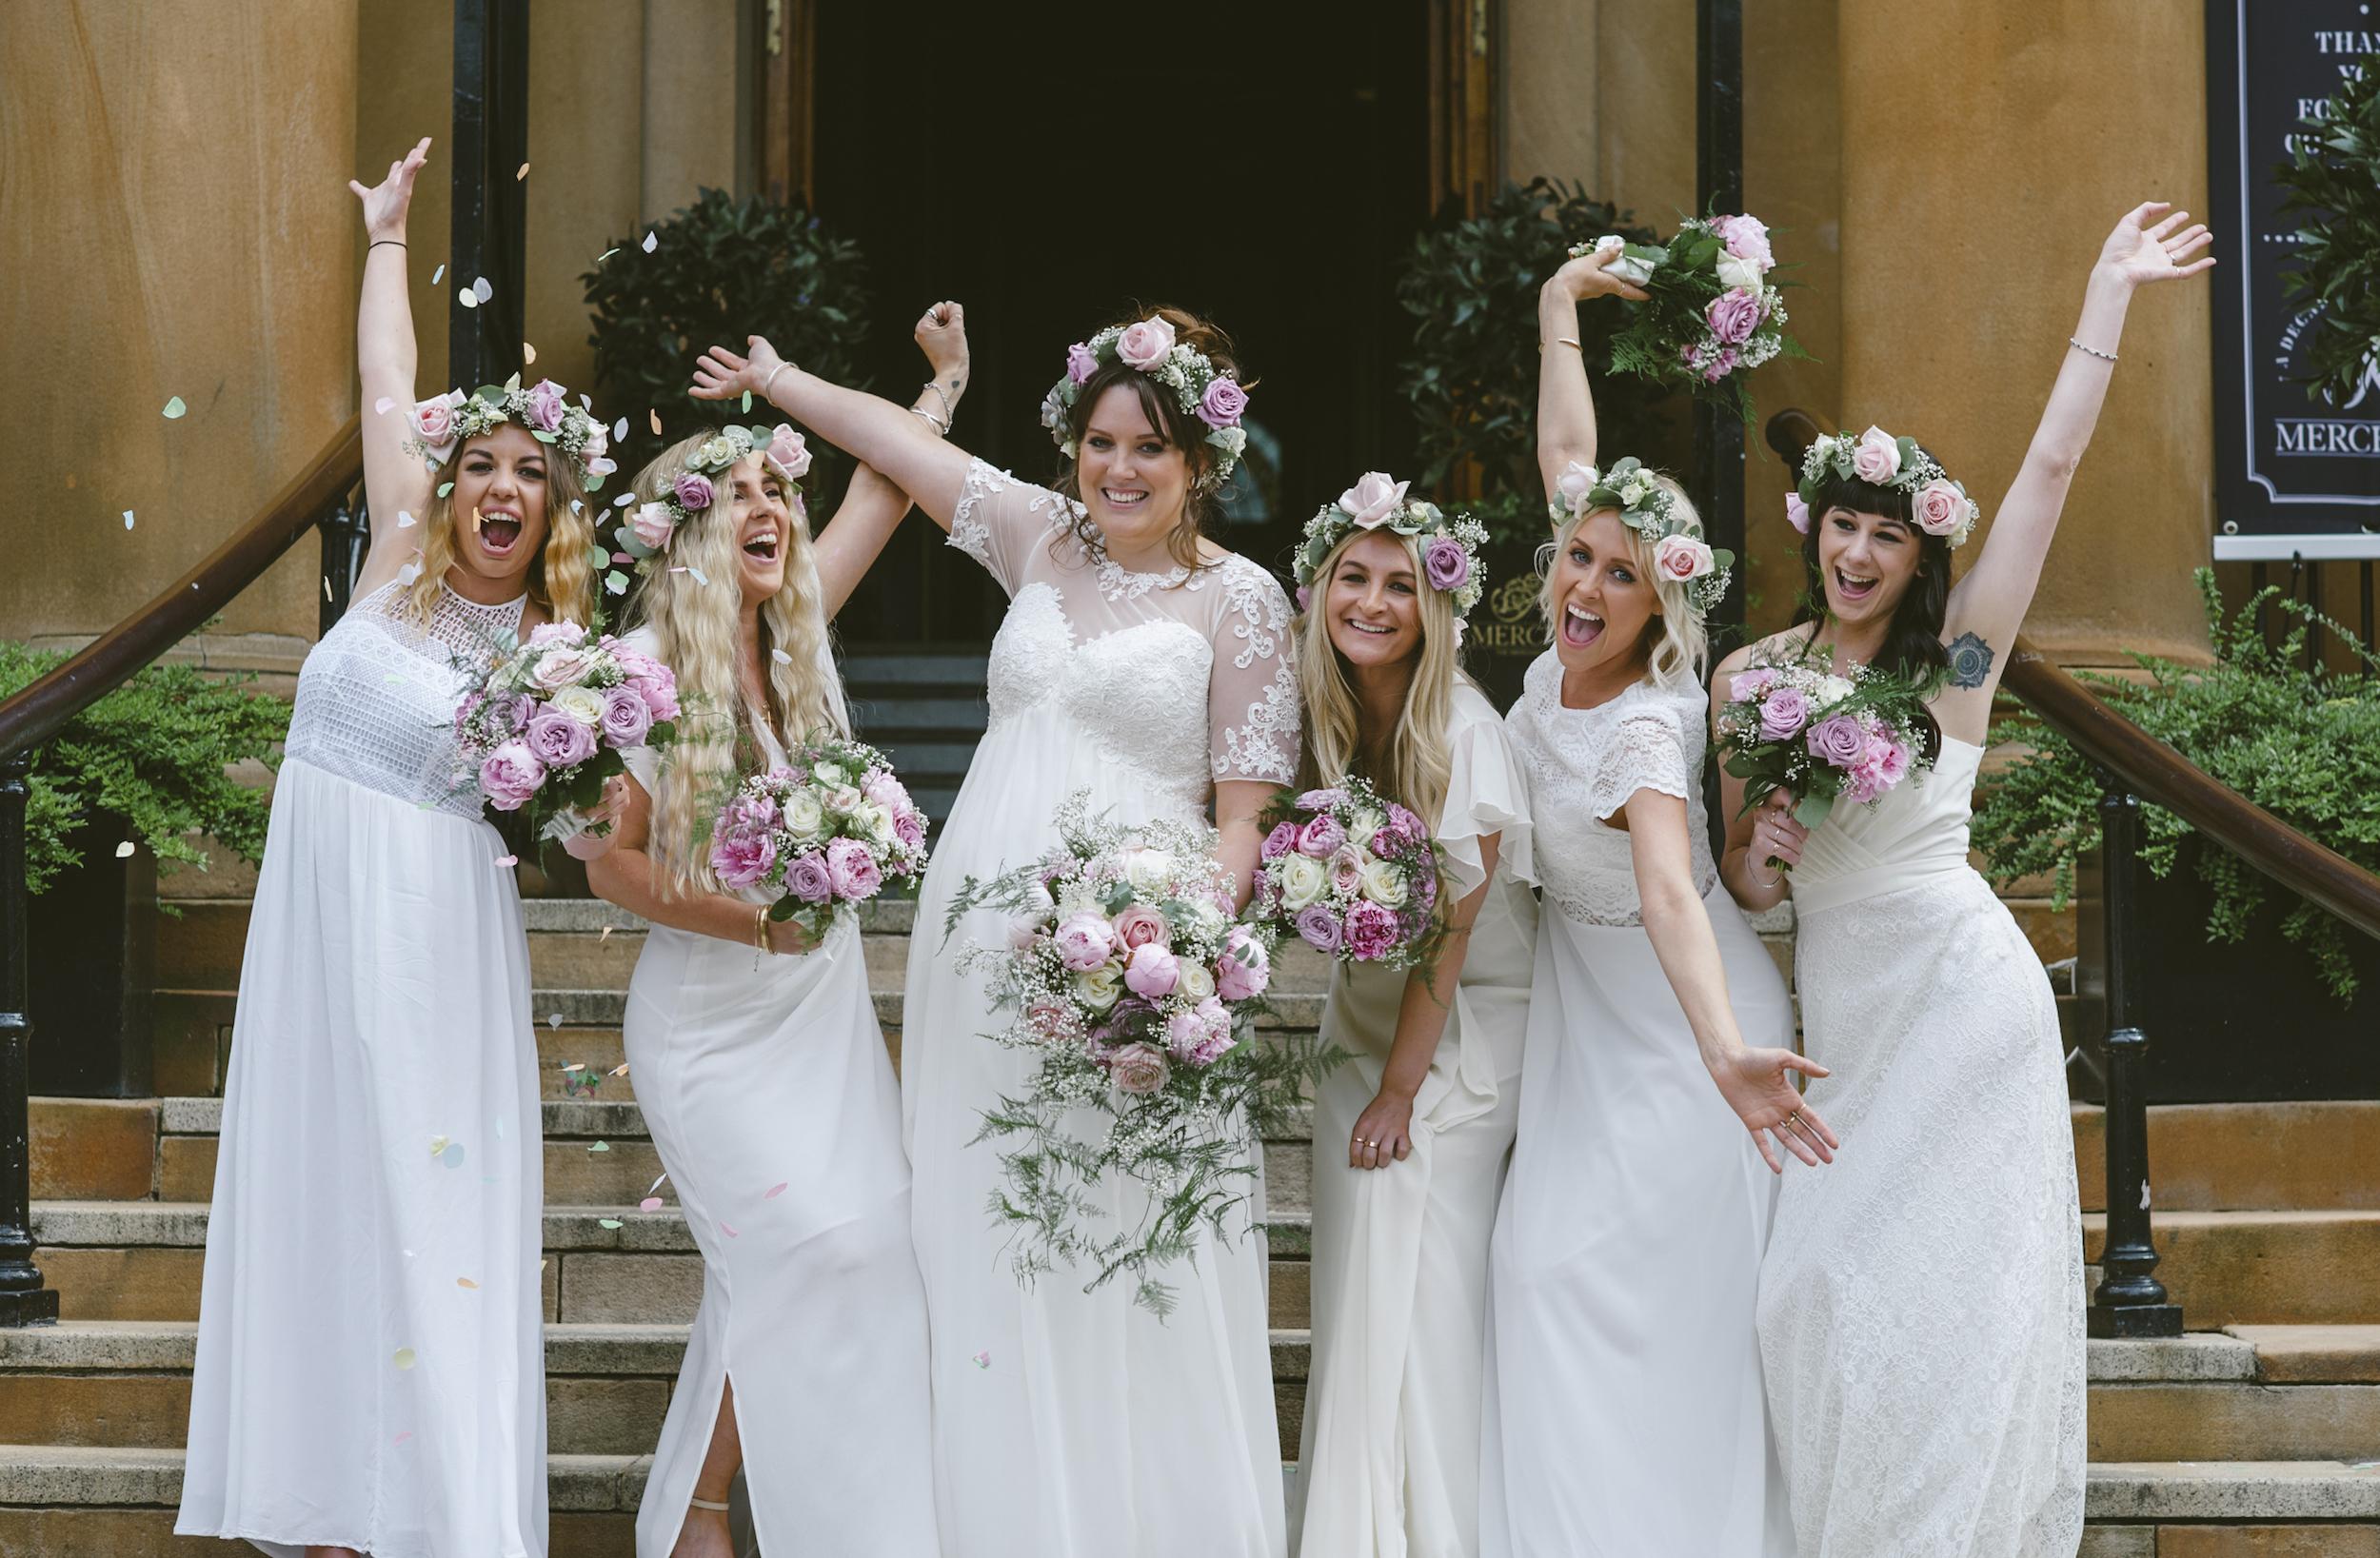 Francis_meaney_photography_merchant_hotel_wedding_belfast_inspire_weddings_7.jpeg